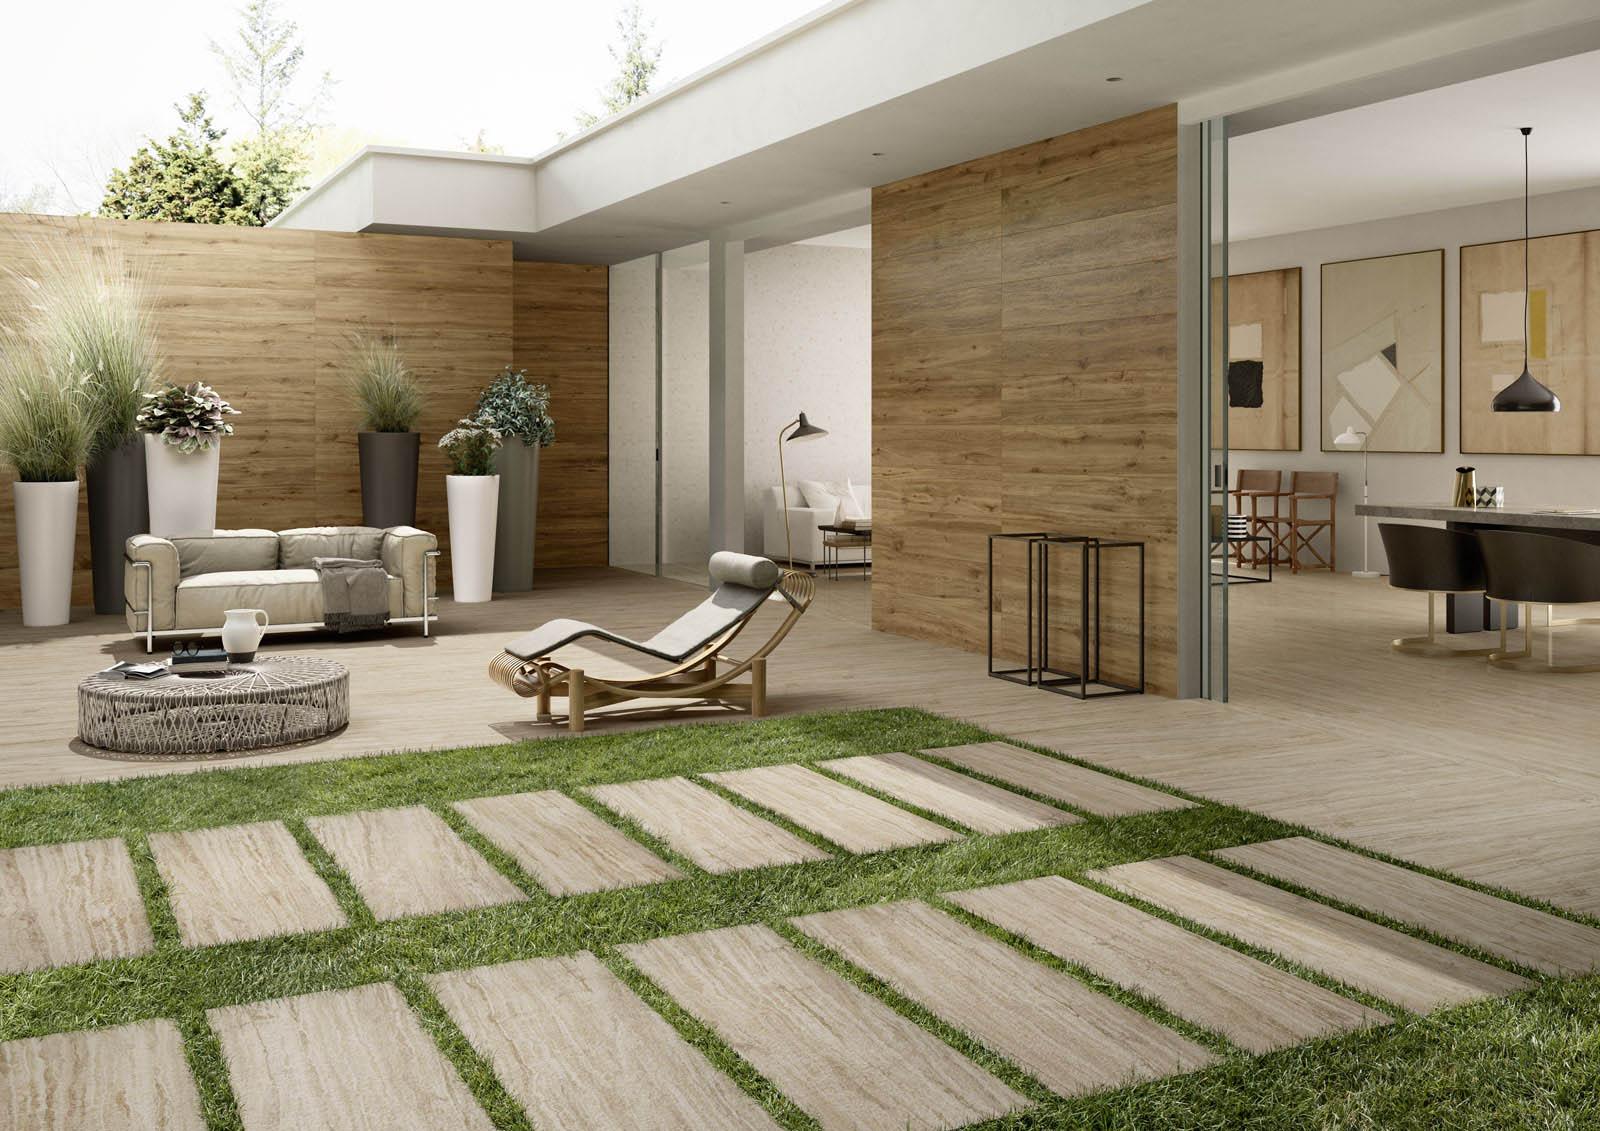 allmarble20 thick porcelain stoneware marble effect marazzi. Black Bedroom Furniture Sets. Home Design Ideas